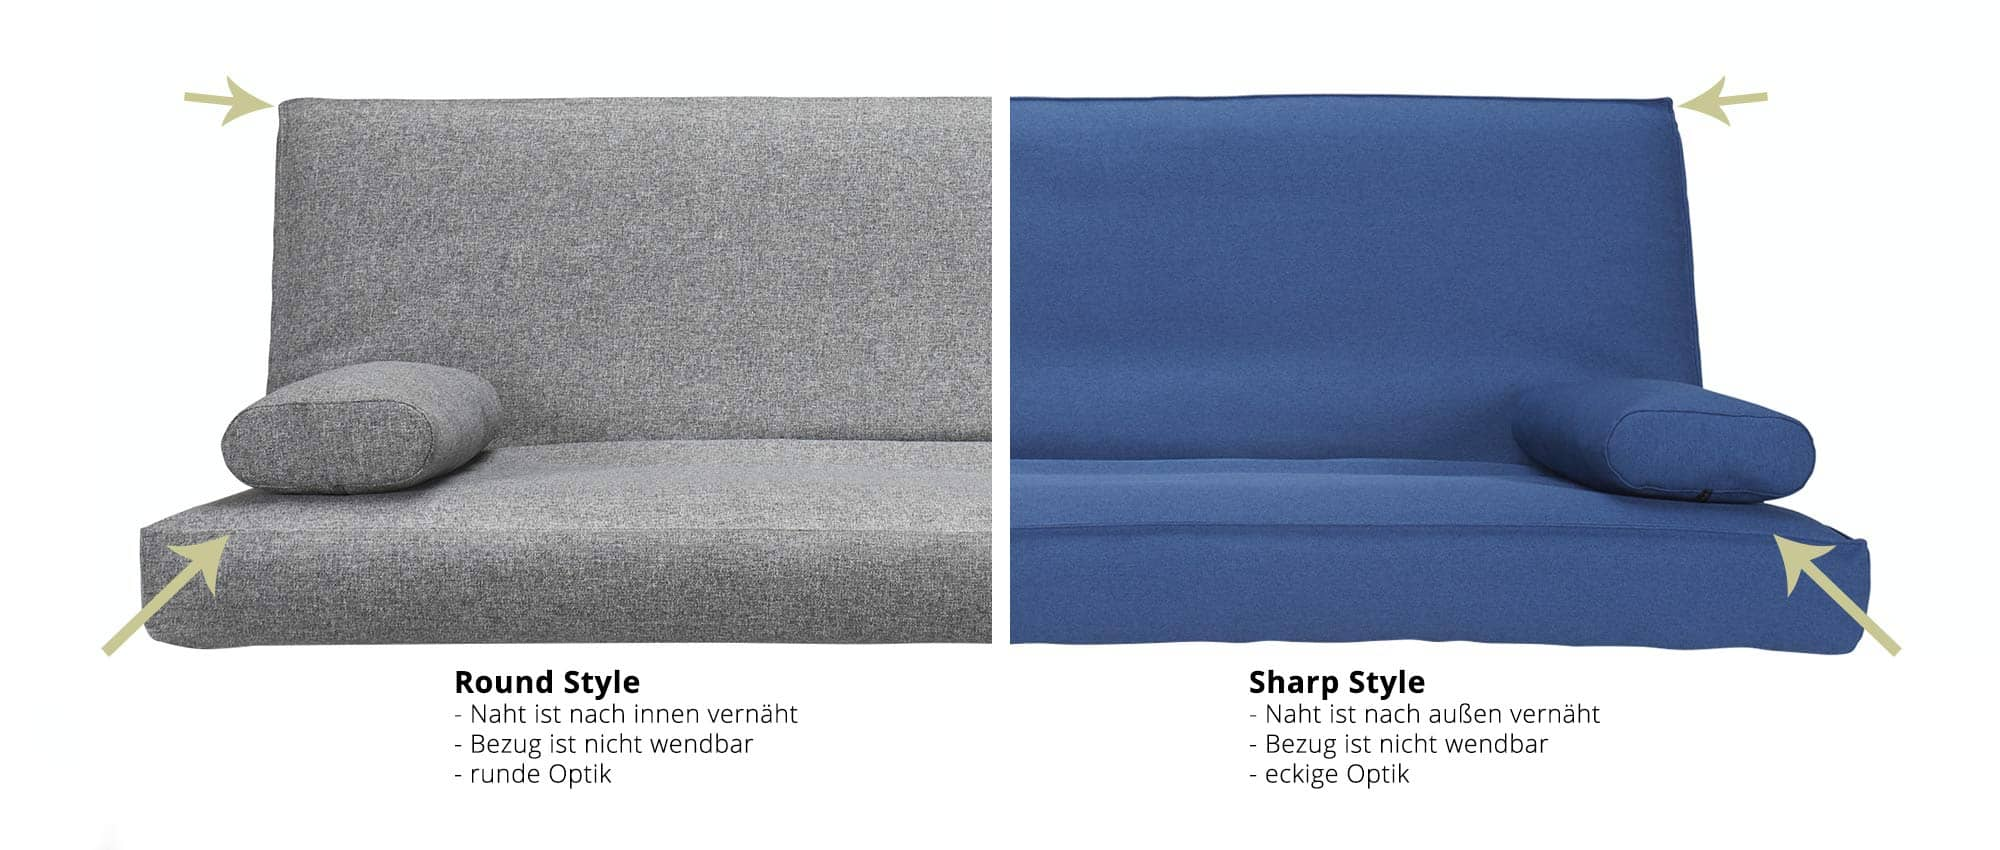 Innovation Ersatzbezug Round Sharp Soft Spring Rollo Style